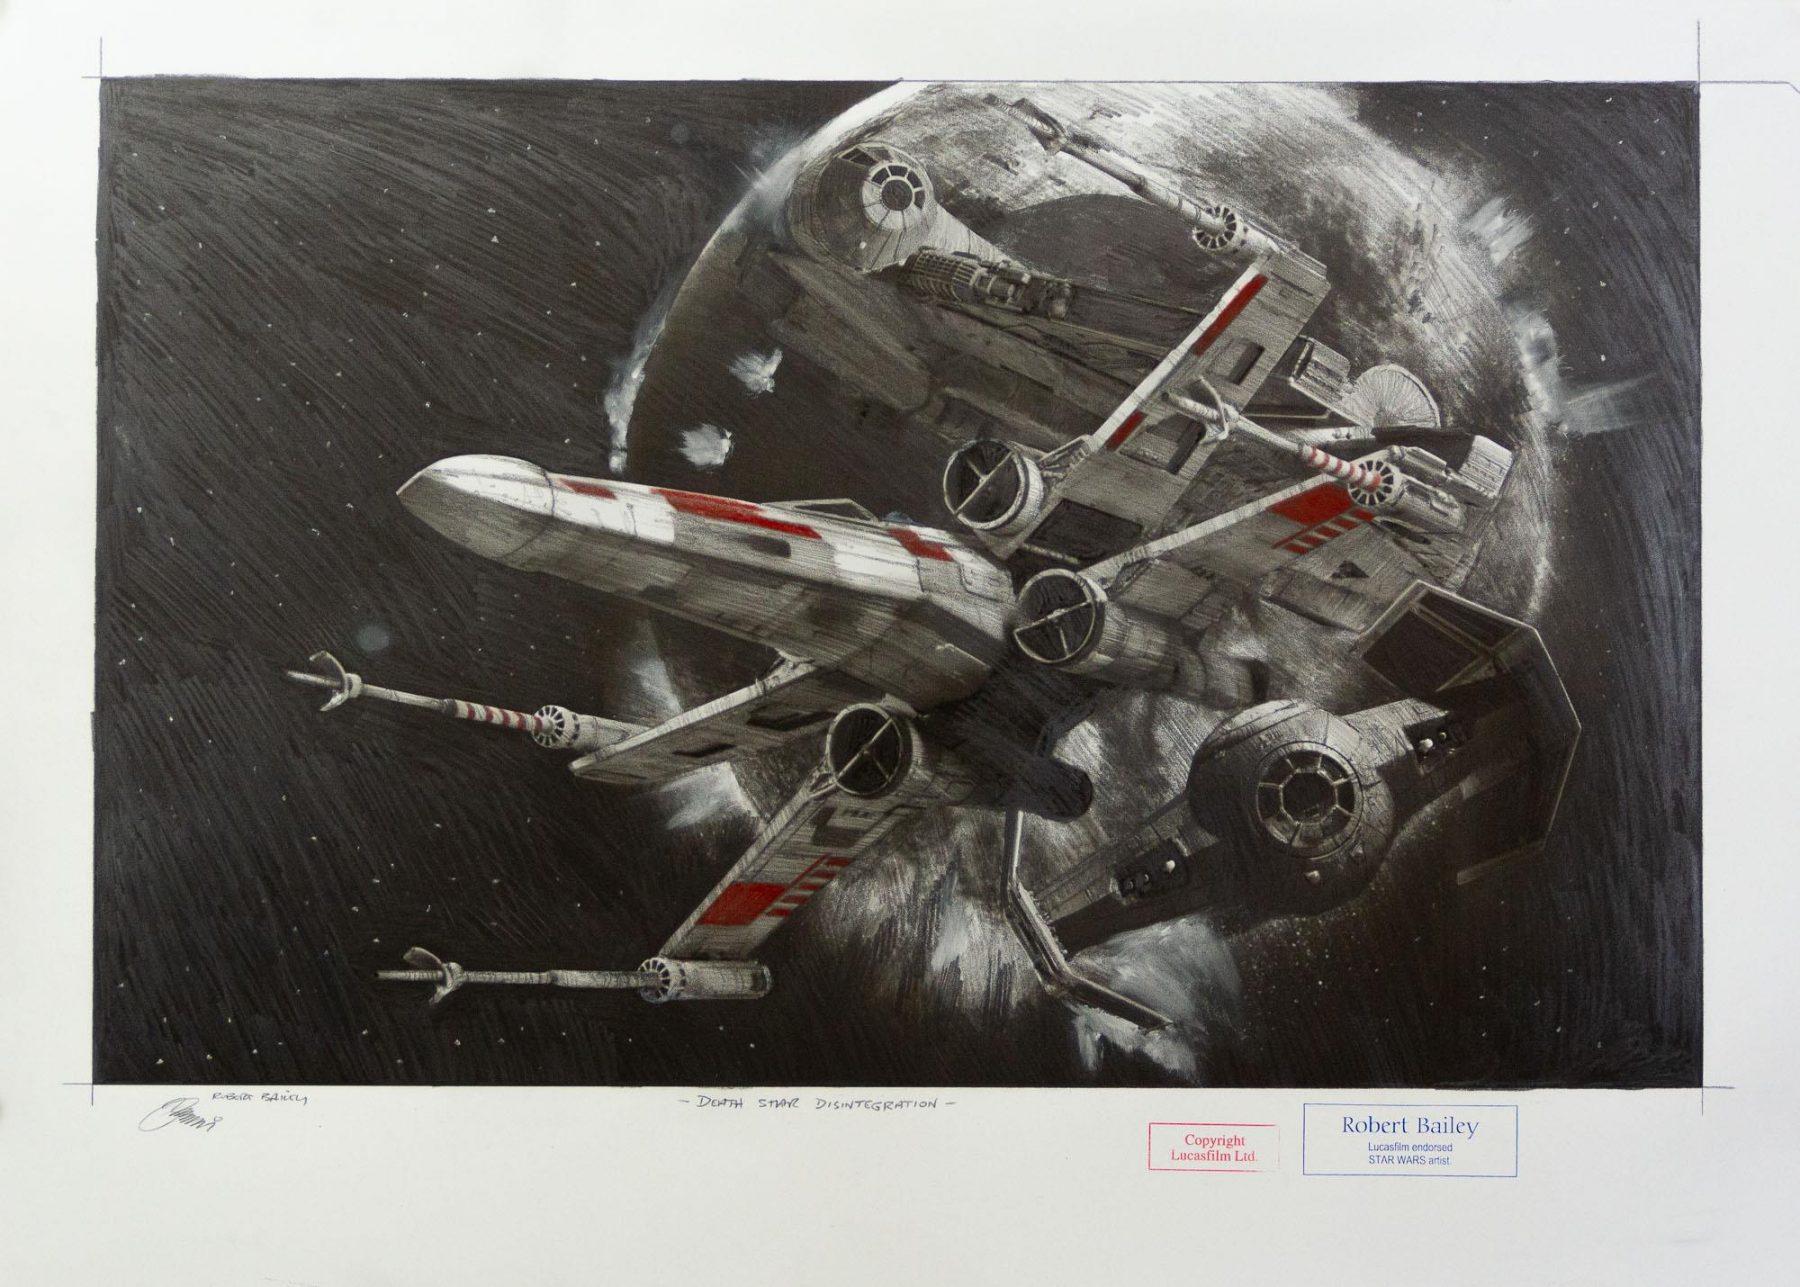 Death Star Disintegration - Bailey, Robert - k-2109RB1